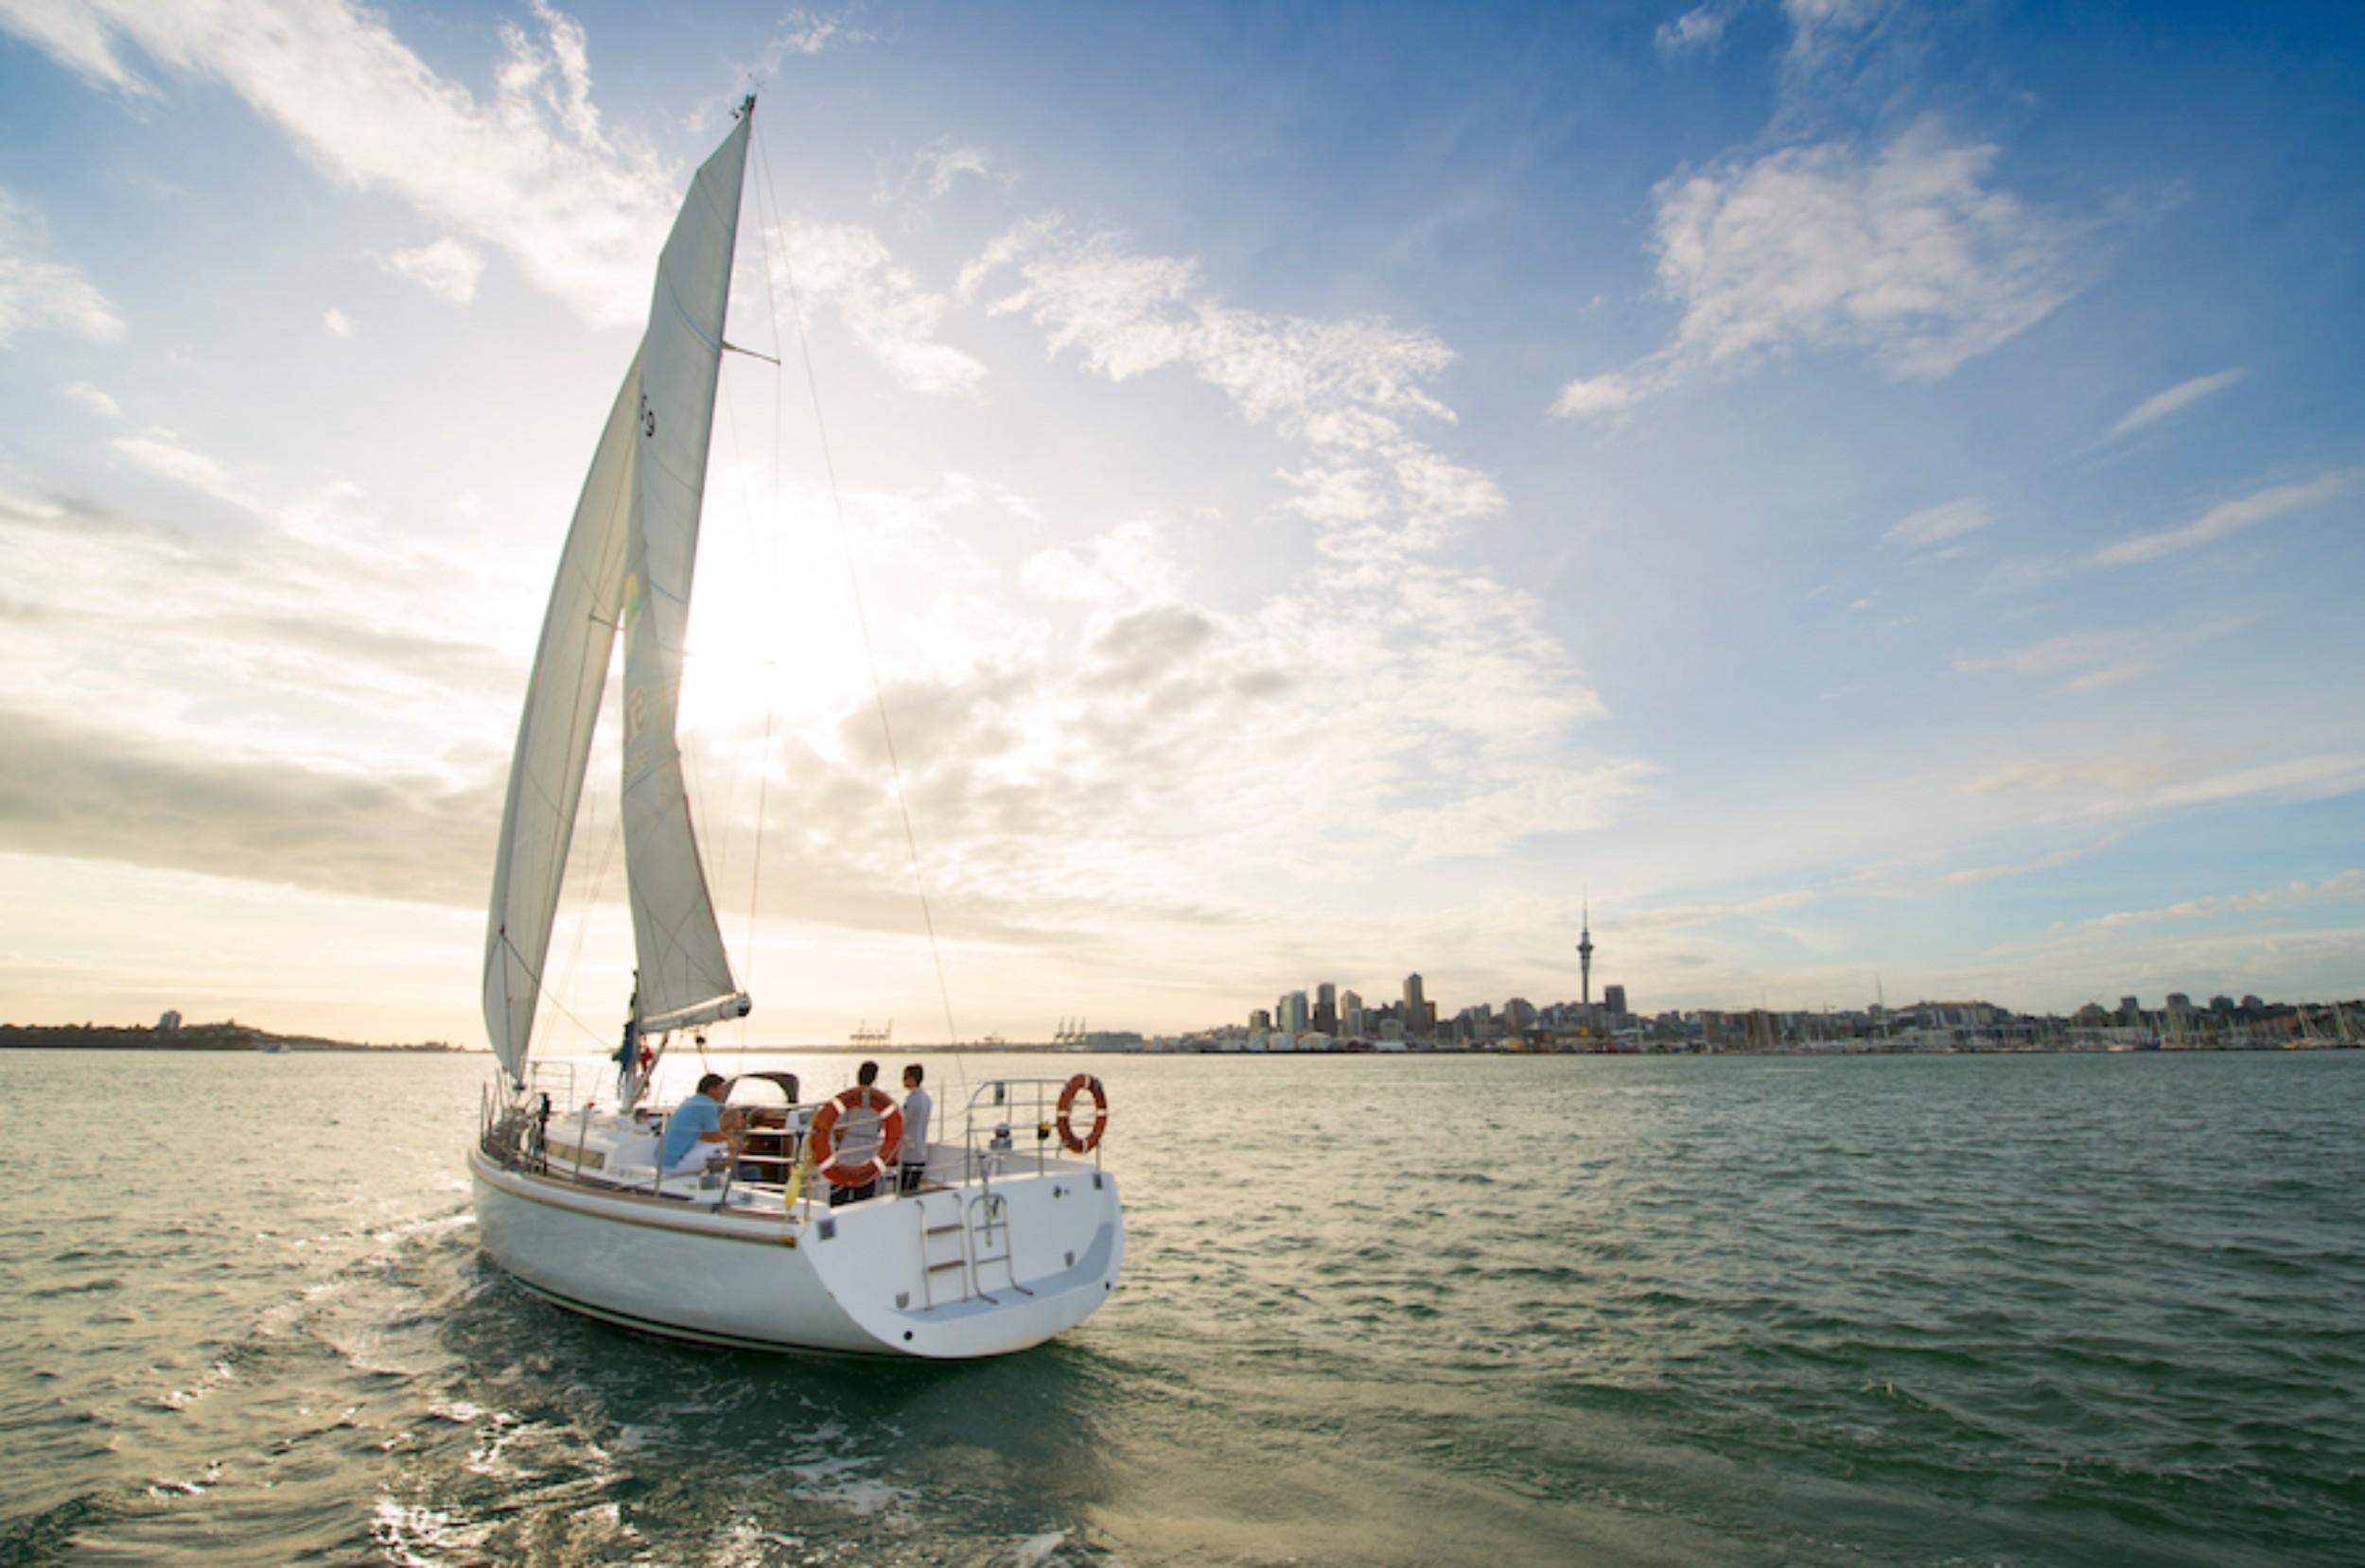 APS1540-Auckland-Harbour-Auckland-Julian-Apse.jpg